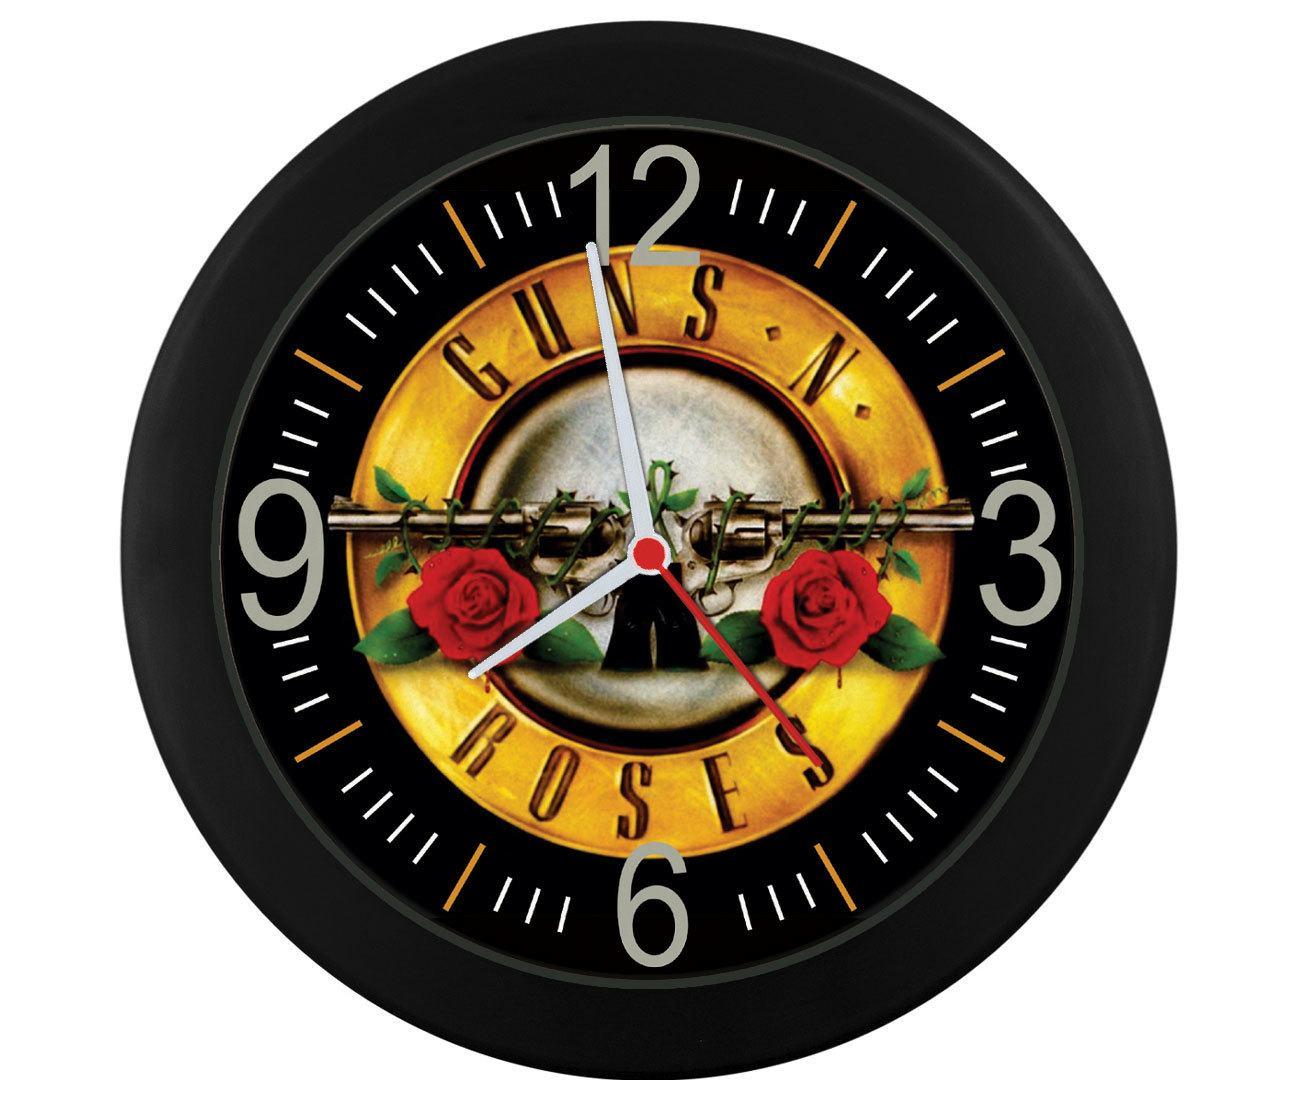 Relógio Guns N Roses Use Your Illusion